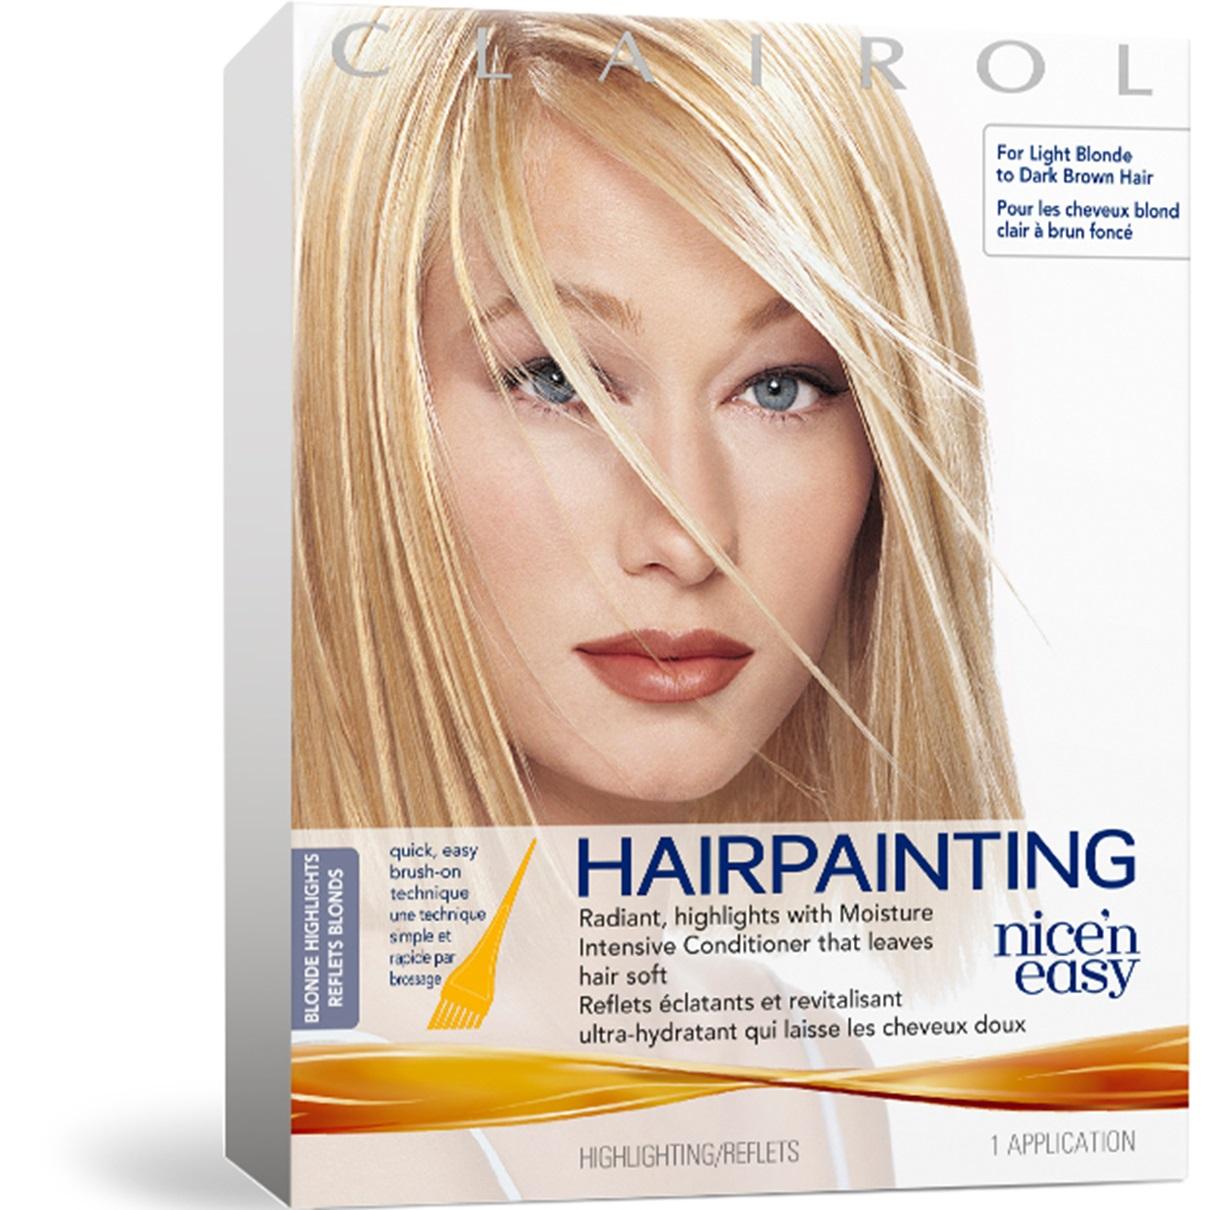 Highlighting blonding clairol nicen easy pmusecretfo Gallery